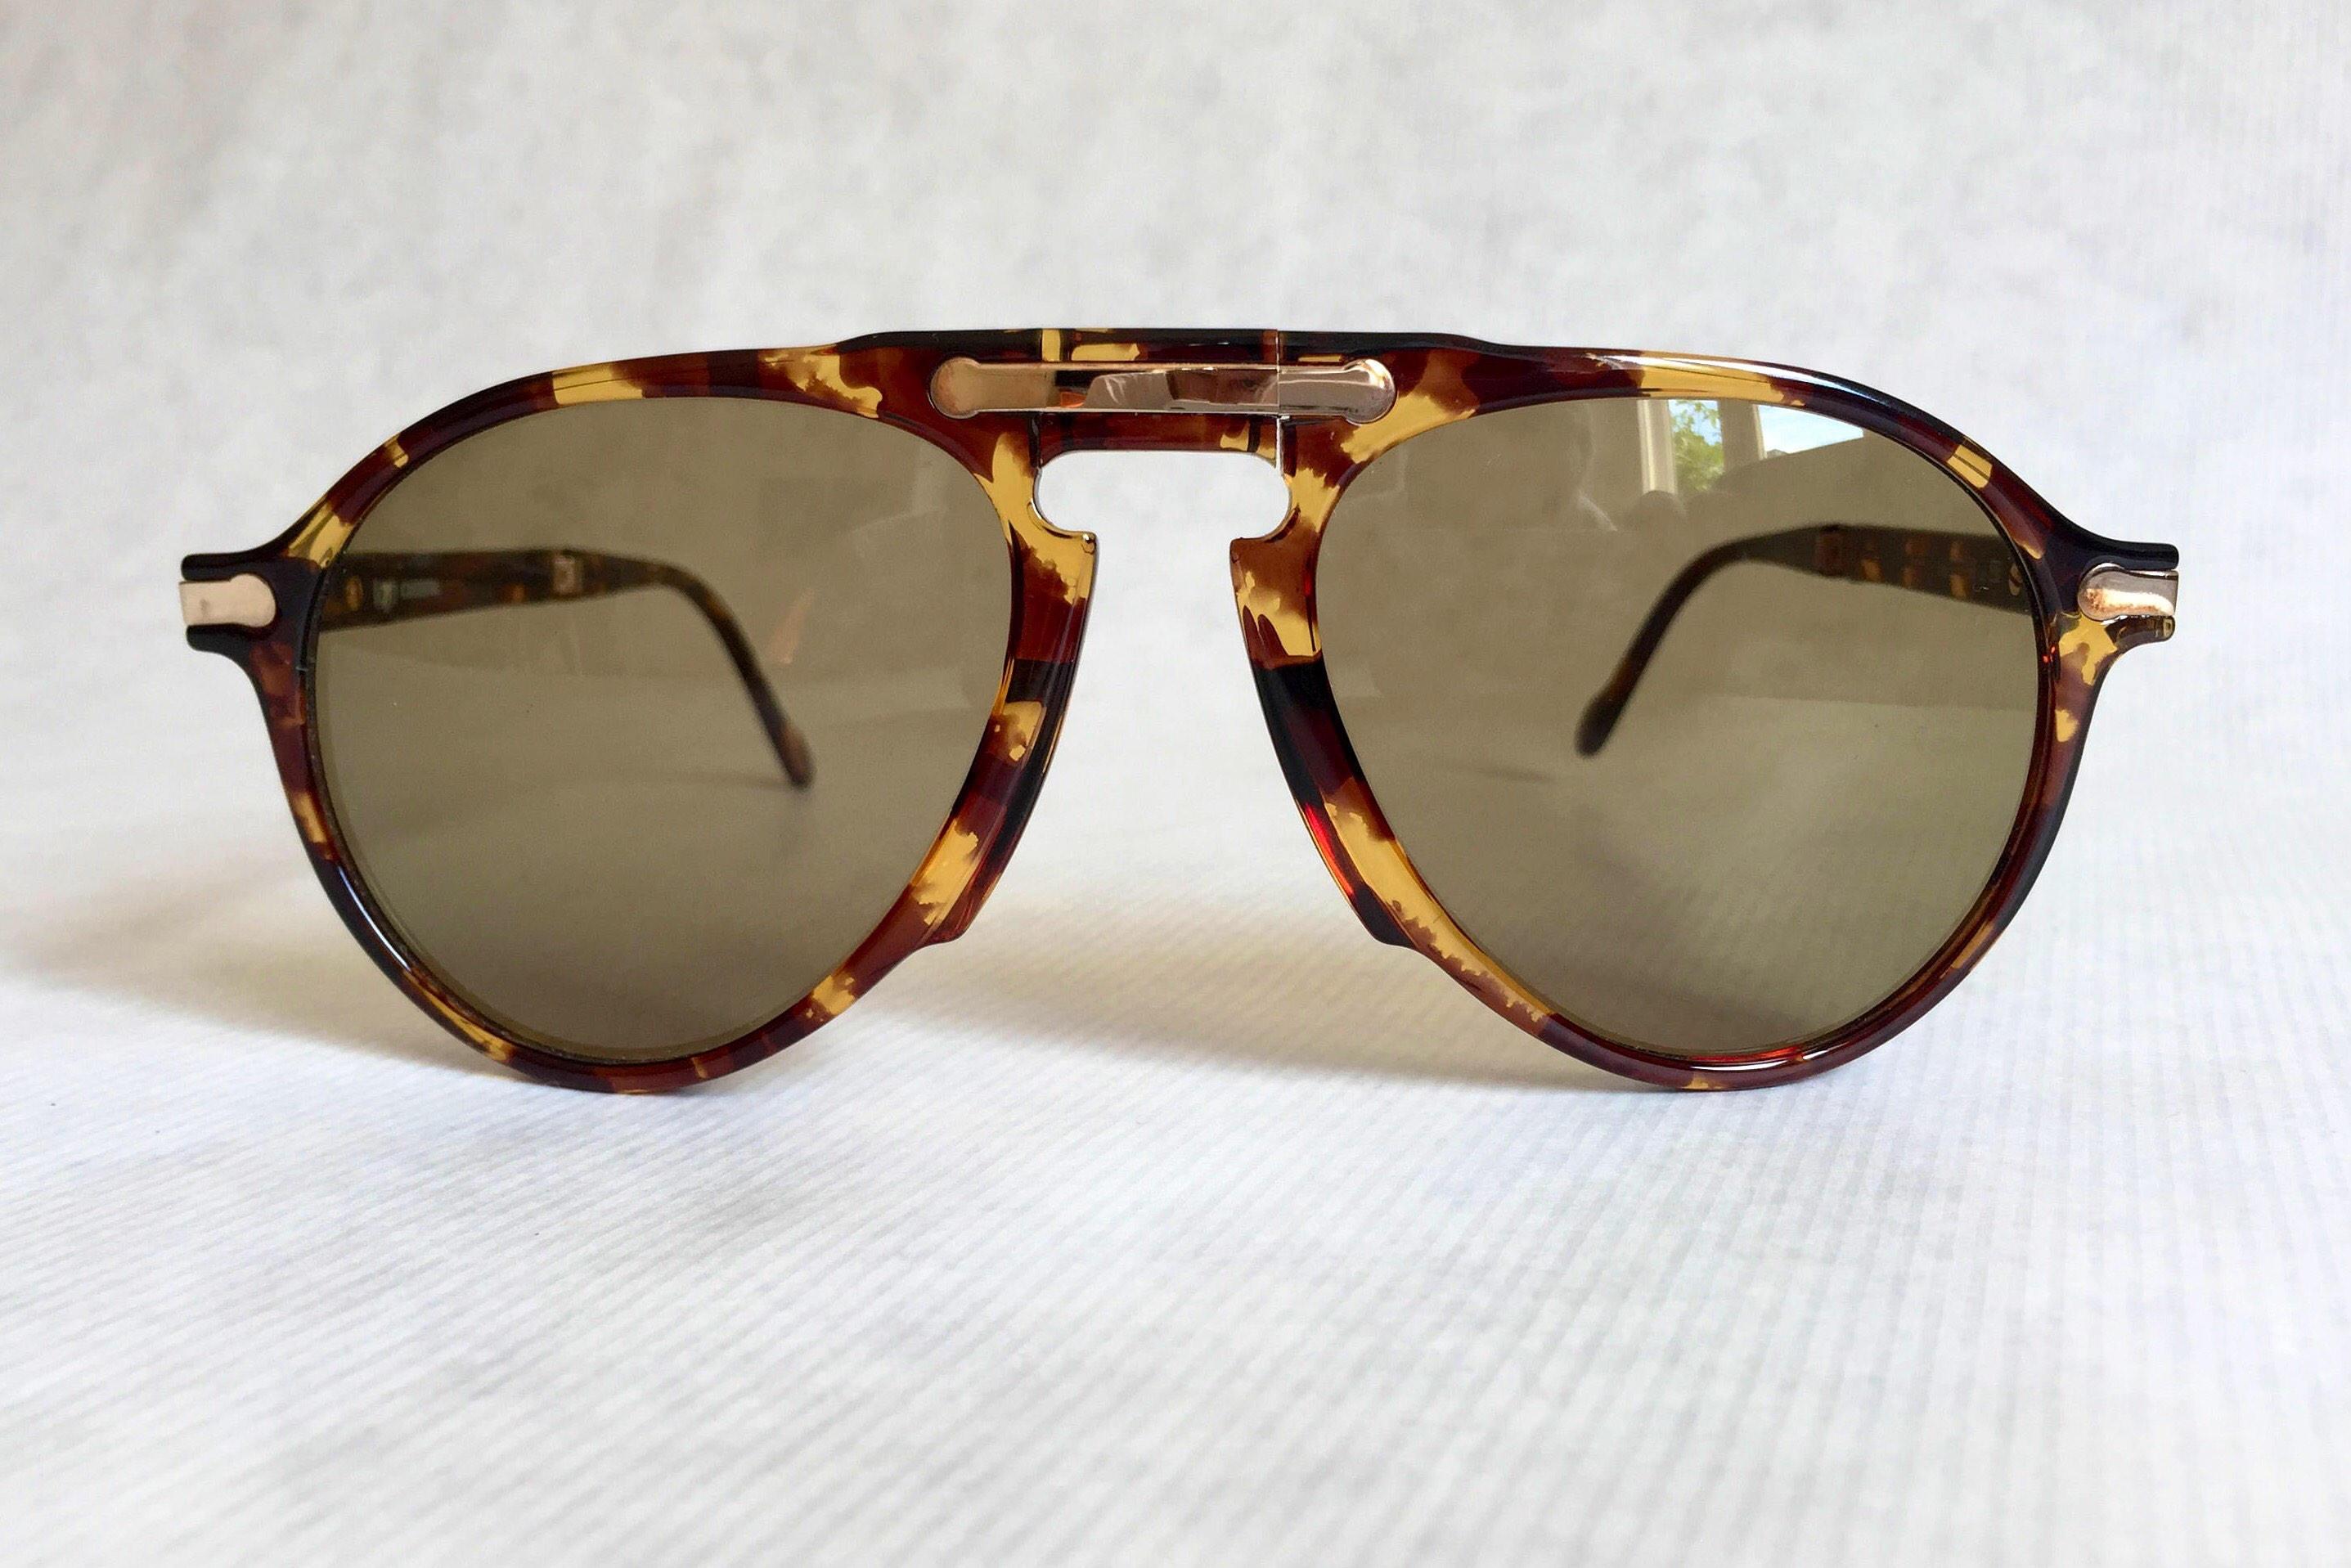 2ee3c1543b Hugo Boss by Carrera 5156 Folding Vintage Sunglasses - New ...